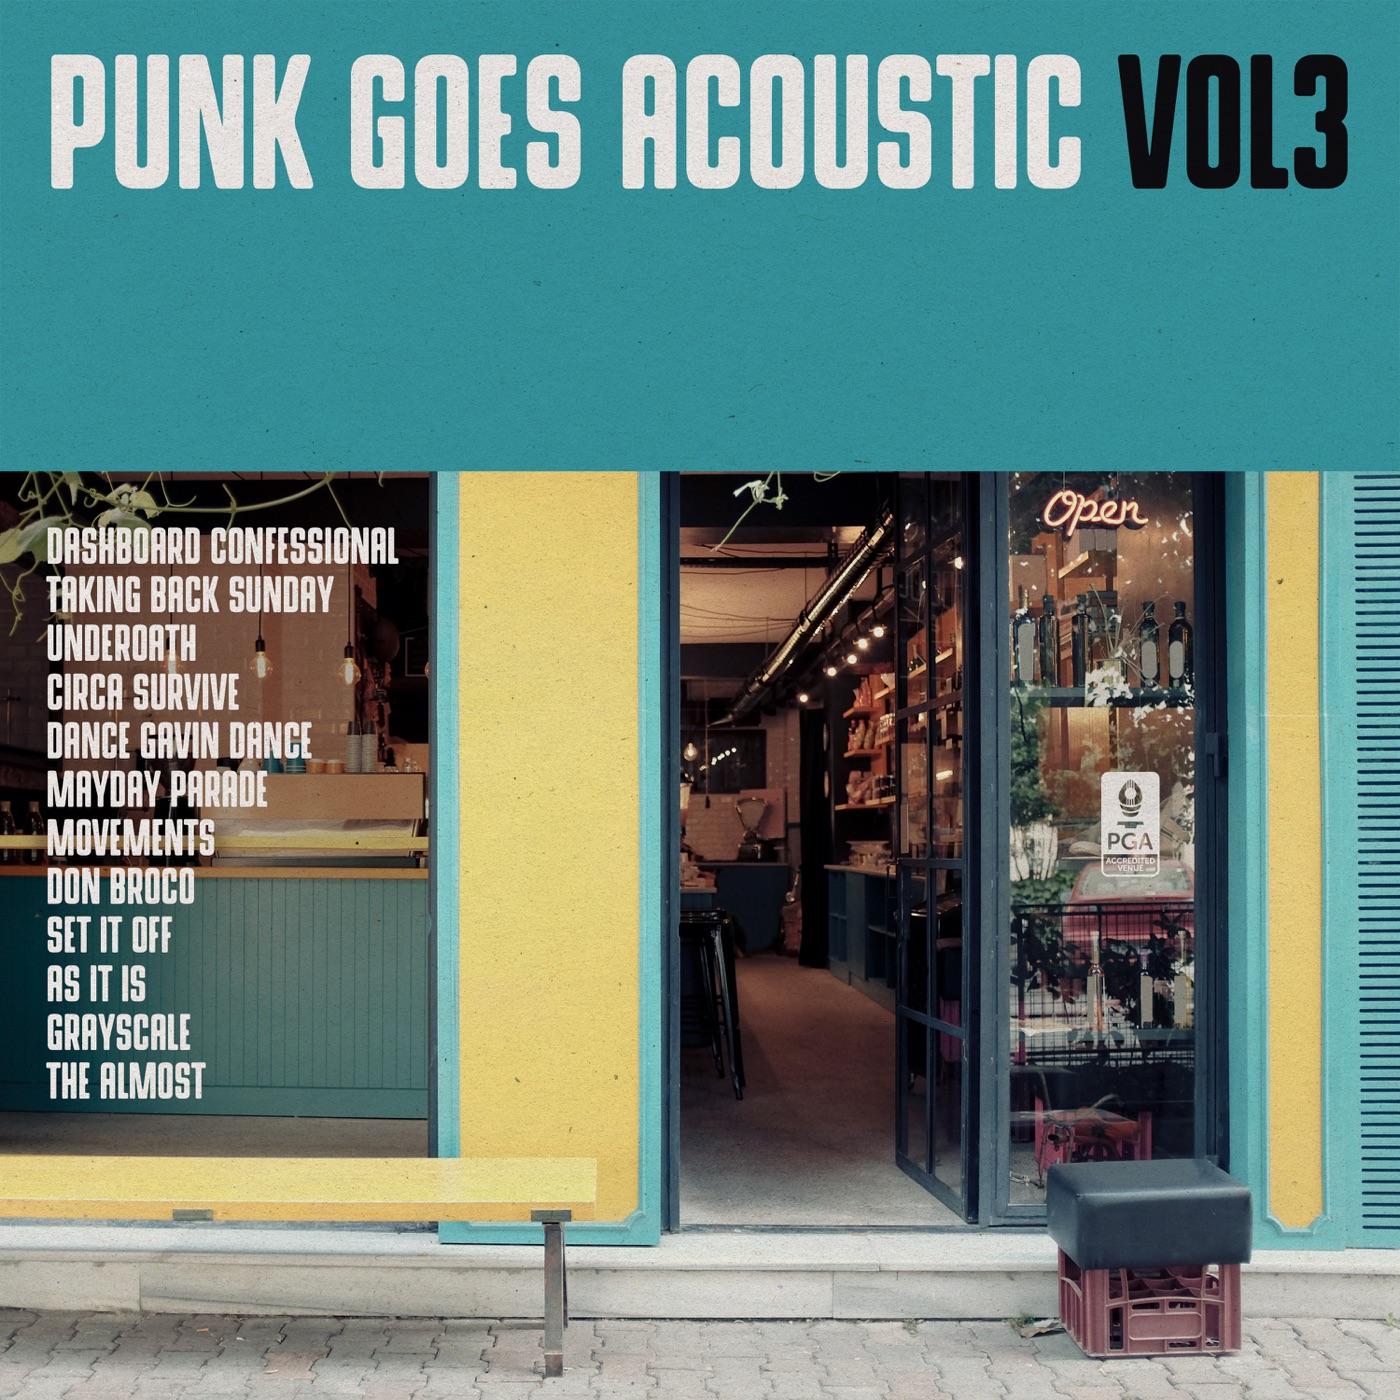 Dance Gavin Dance - Story of My Bros [Acoustic] (Single) (2019)